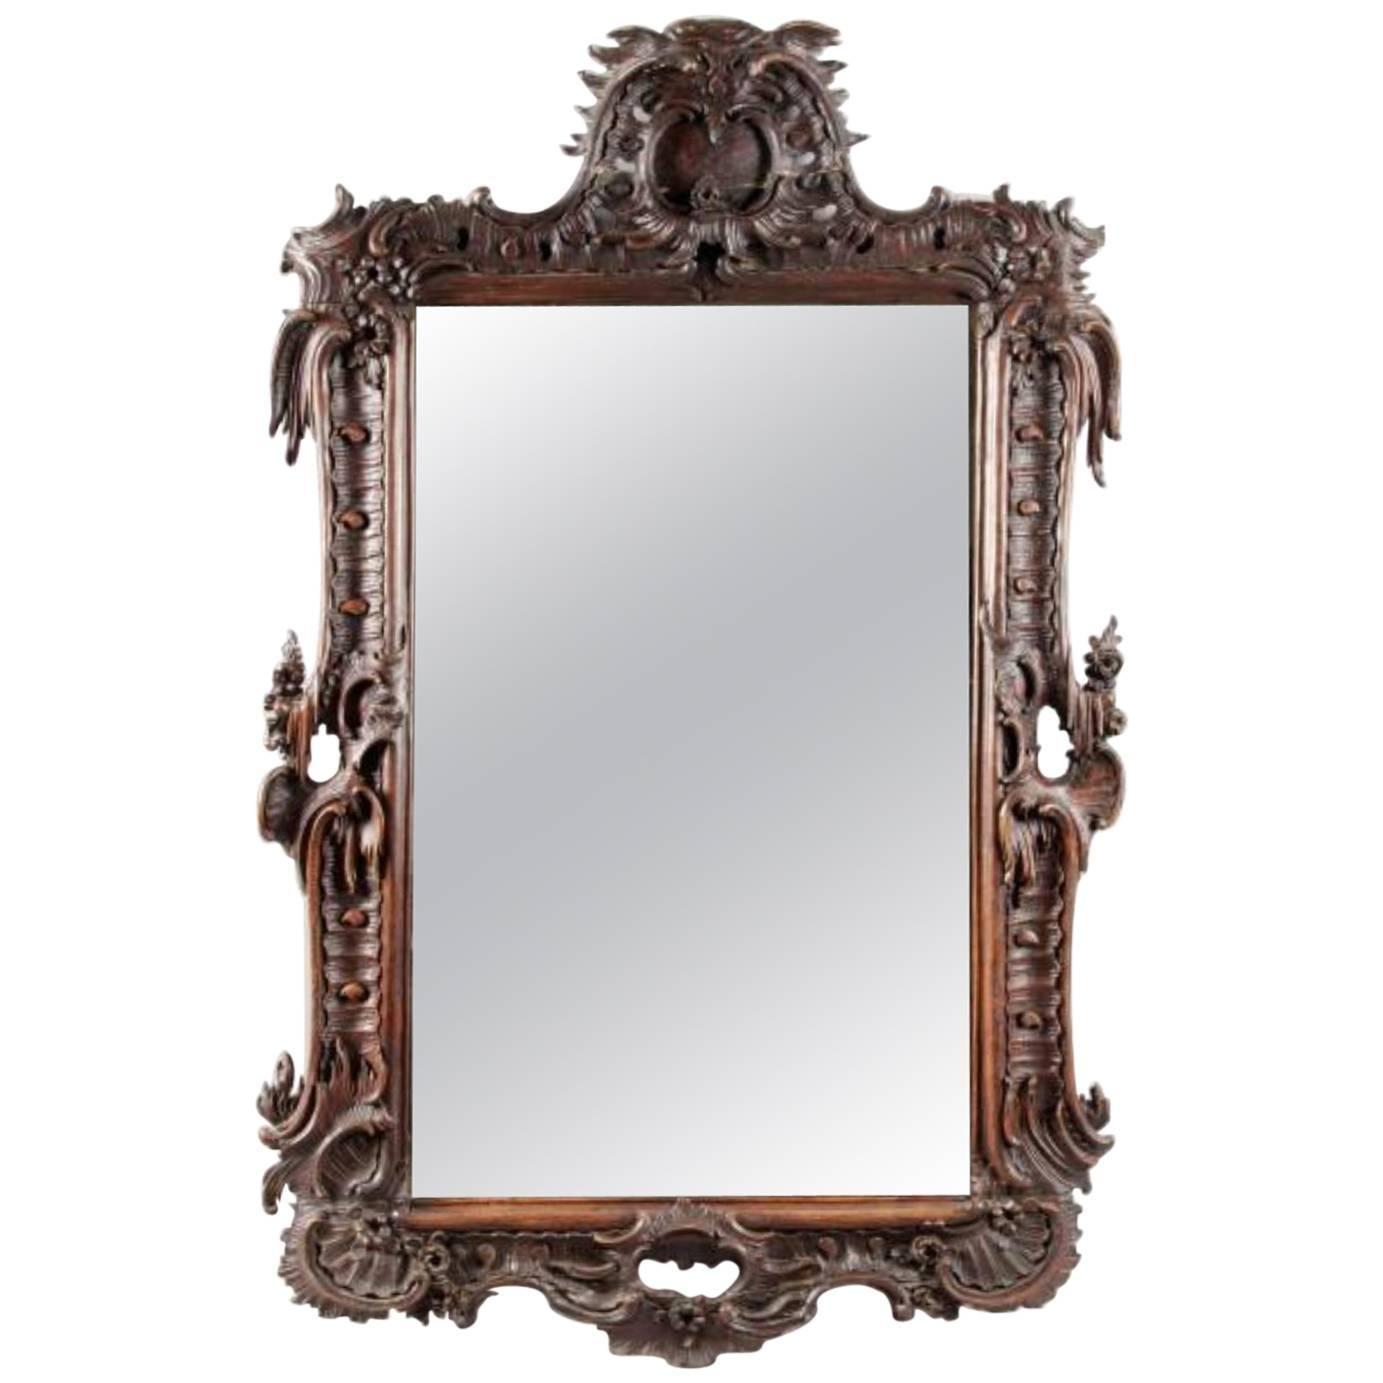 19th Century Walnut Hand-Carved Mirror by Nicolas Pineau